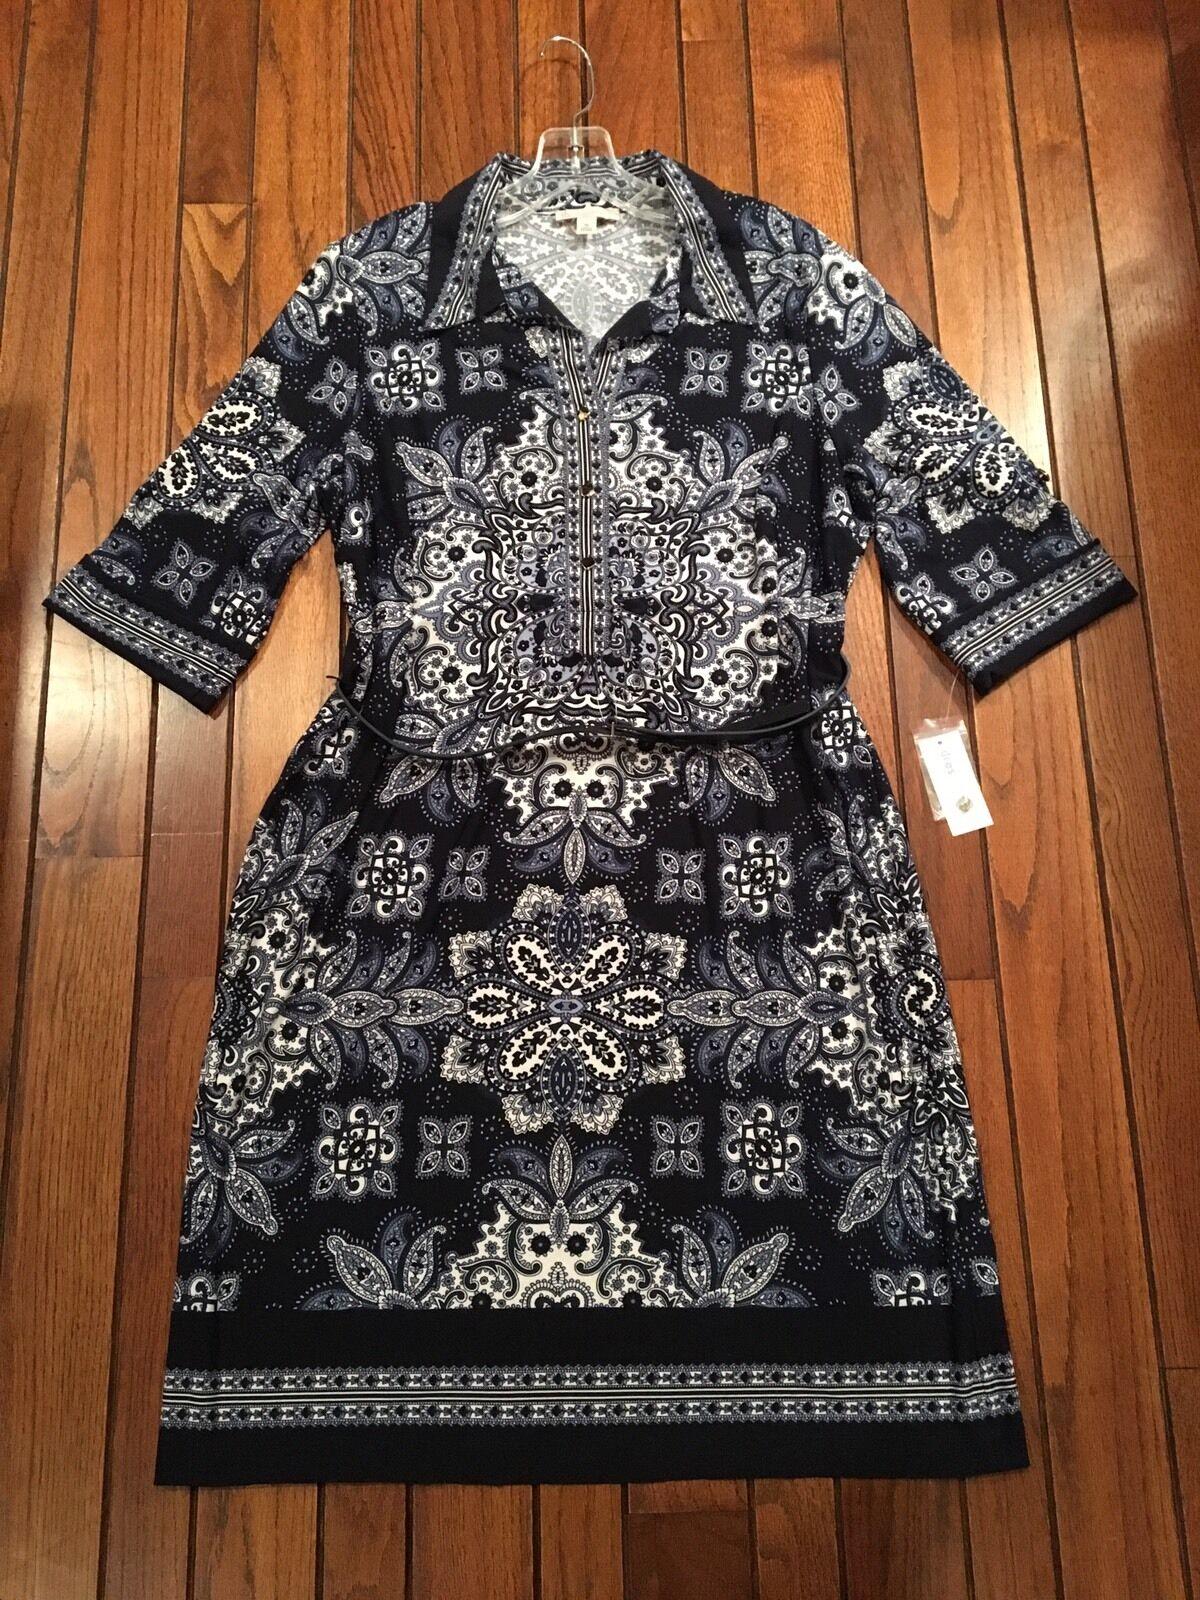 NWT Women 16 Dressbarn bluee Knit Floral Paisley Spring Shirt Sheath Dress Career